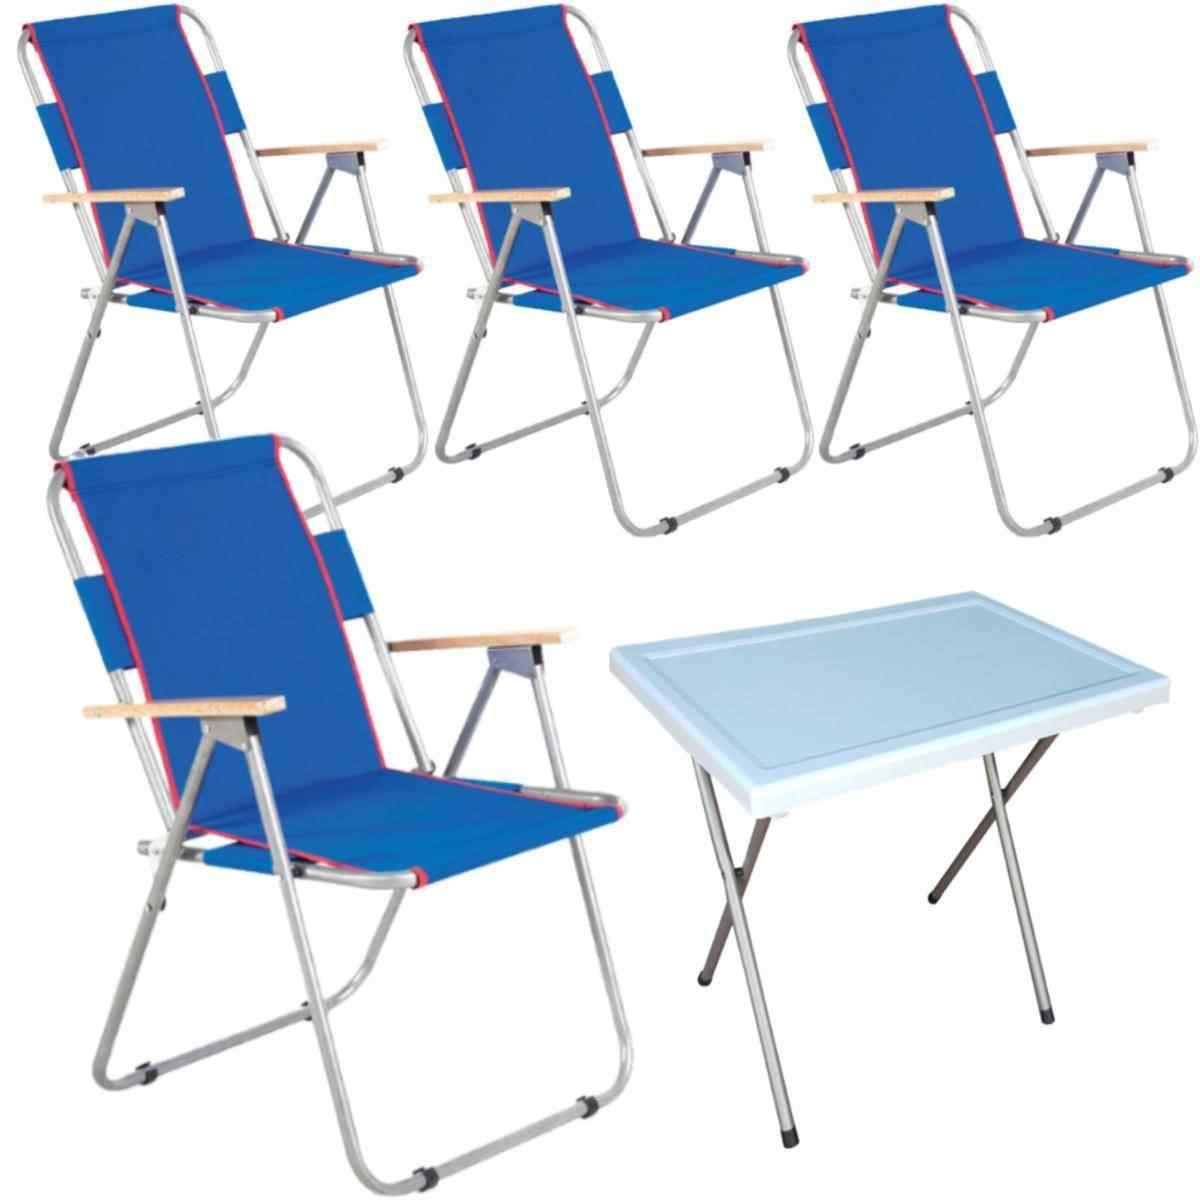 Vesto Katlanabilir Piknik Sandalyesi Ve Portatif Masa 4 +1 Mavi